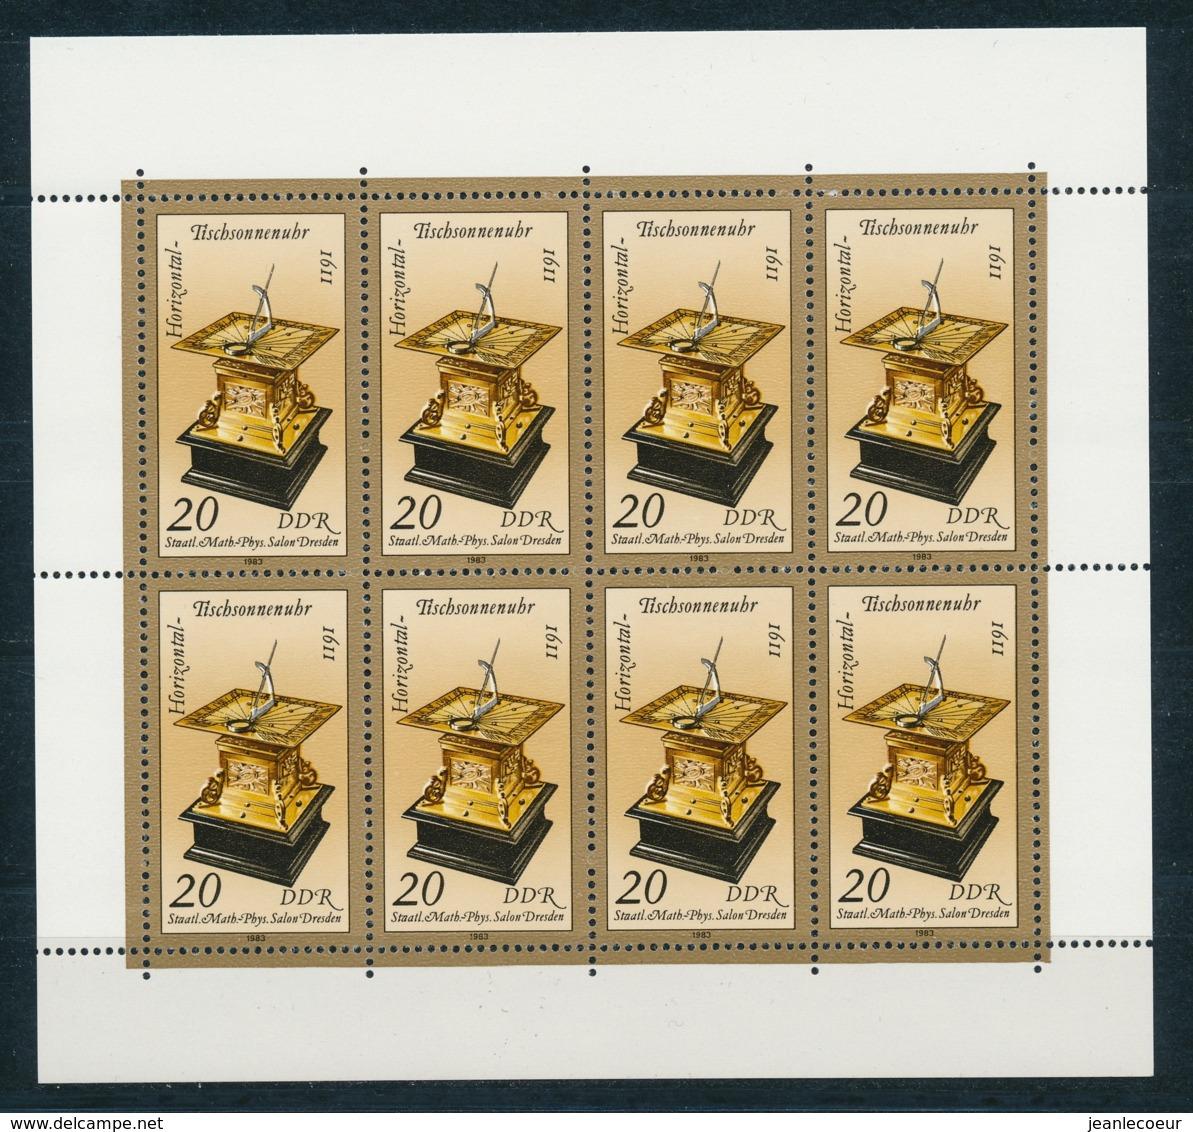 DDR/East Germany/Allemagne Orientale 1983 Mi: Klb 2798 + 2798 I (PF/MNH/Neuf Sans Ch/nuovo Senza C./**)(4489) - [6] Oost-Duitsland